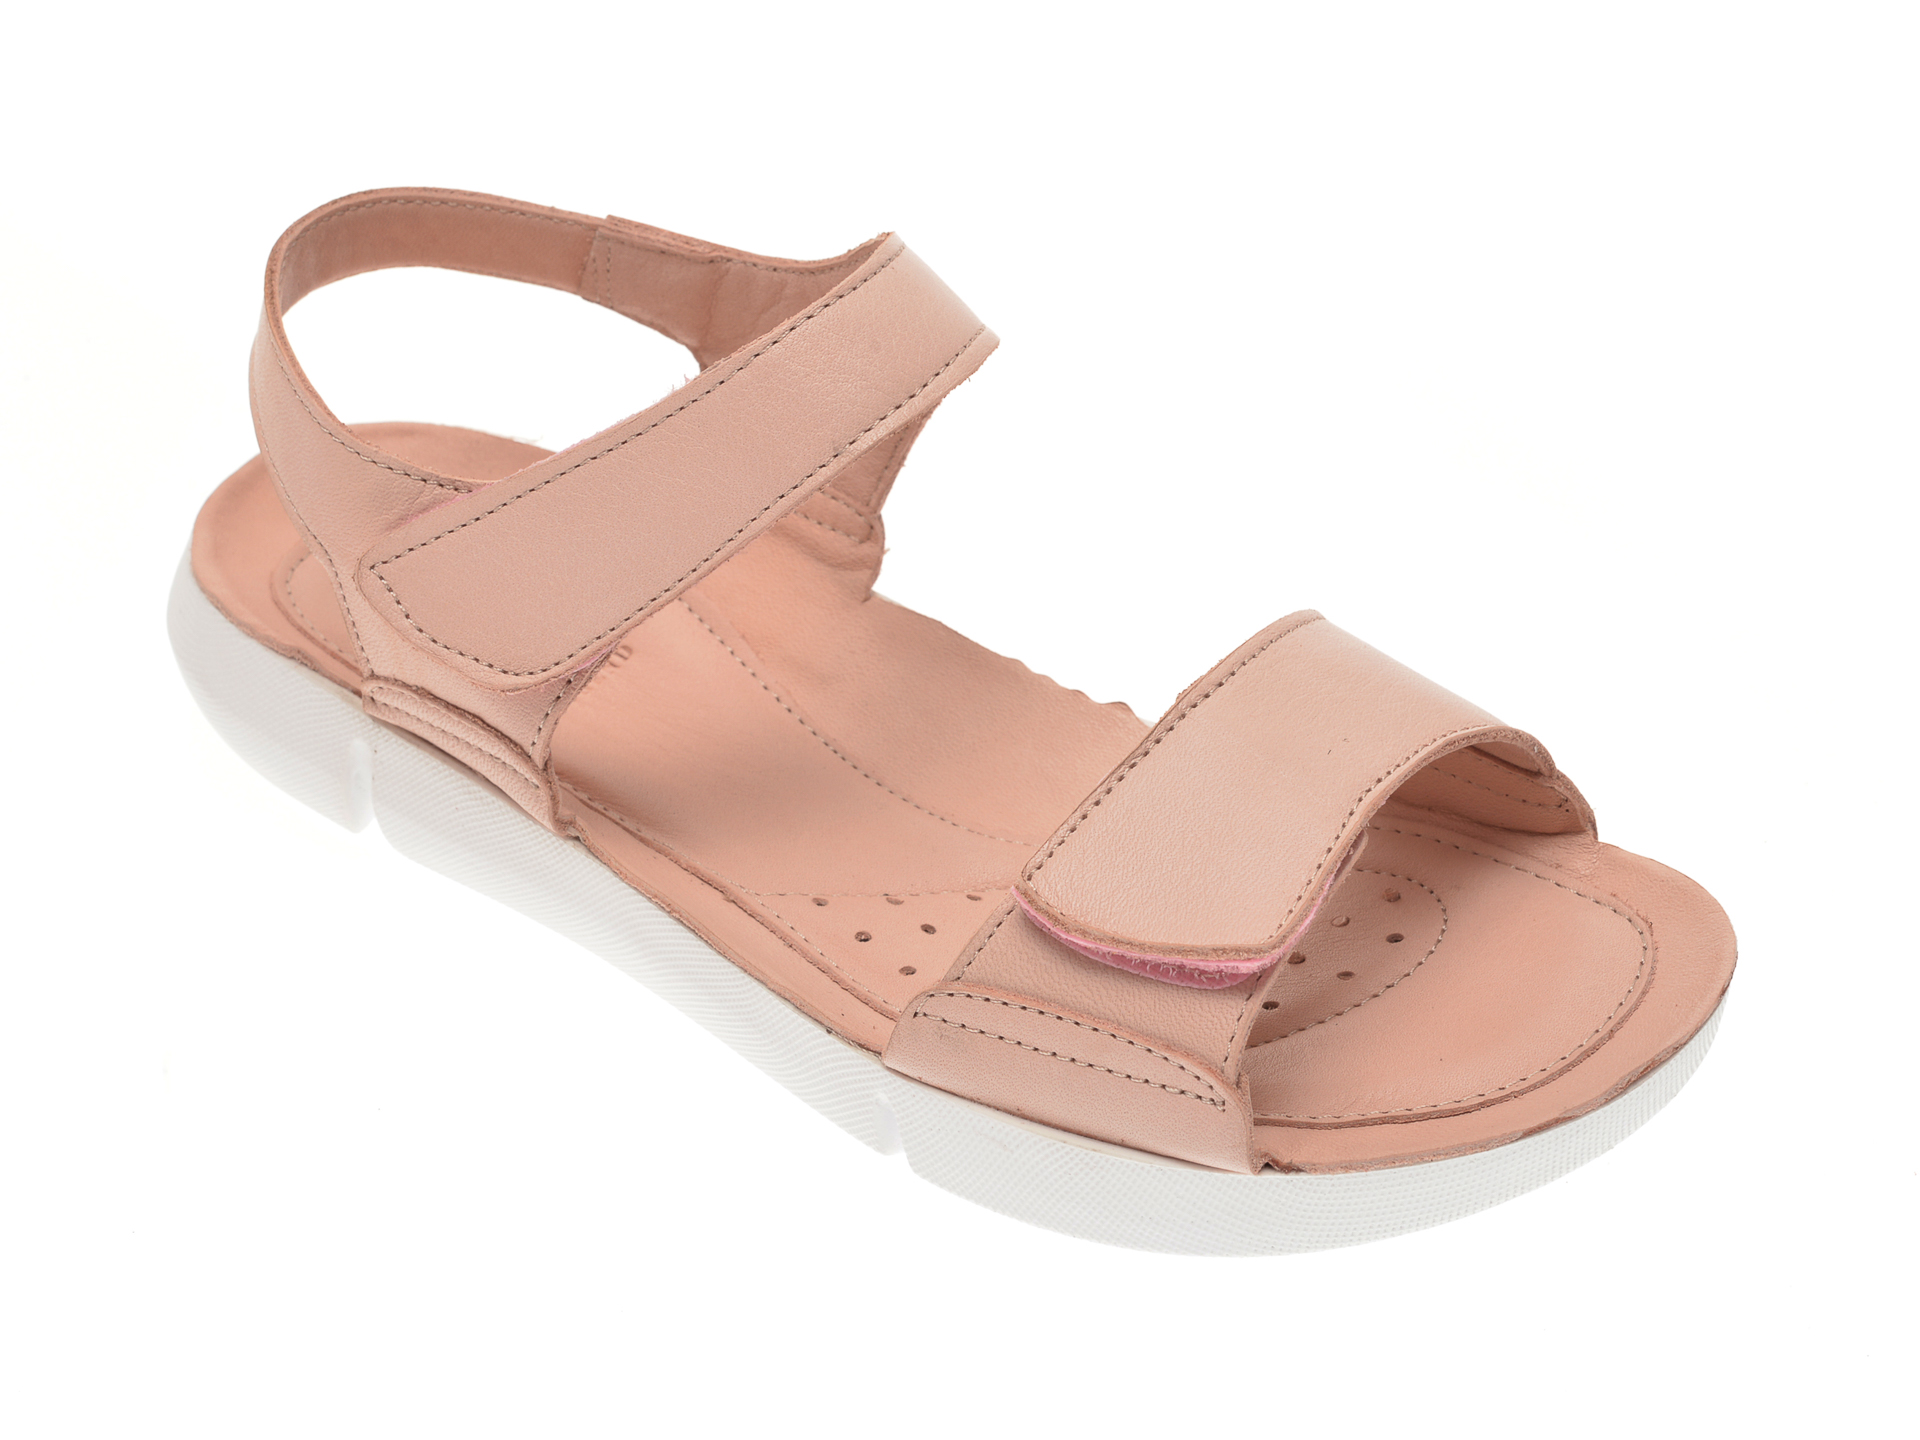 Sandale X TREND nude, 6004, din piele naturala New